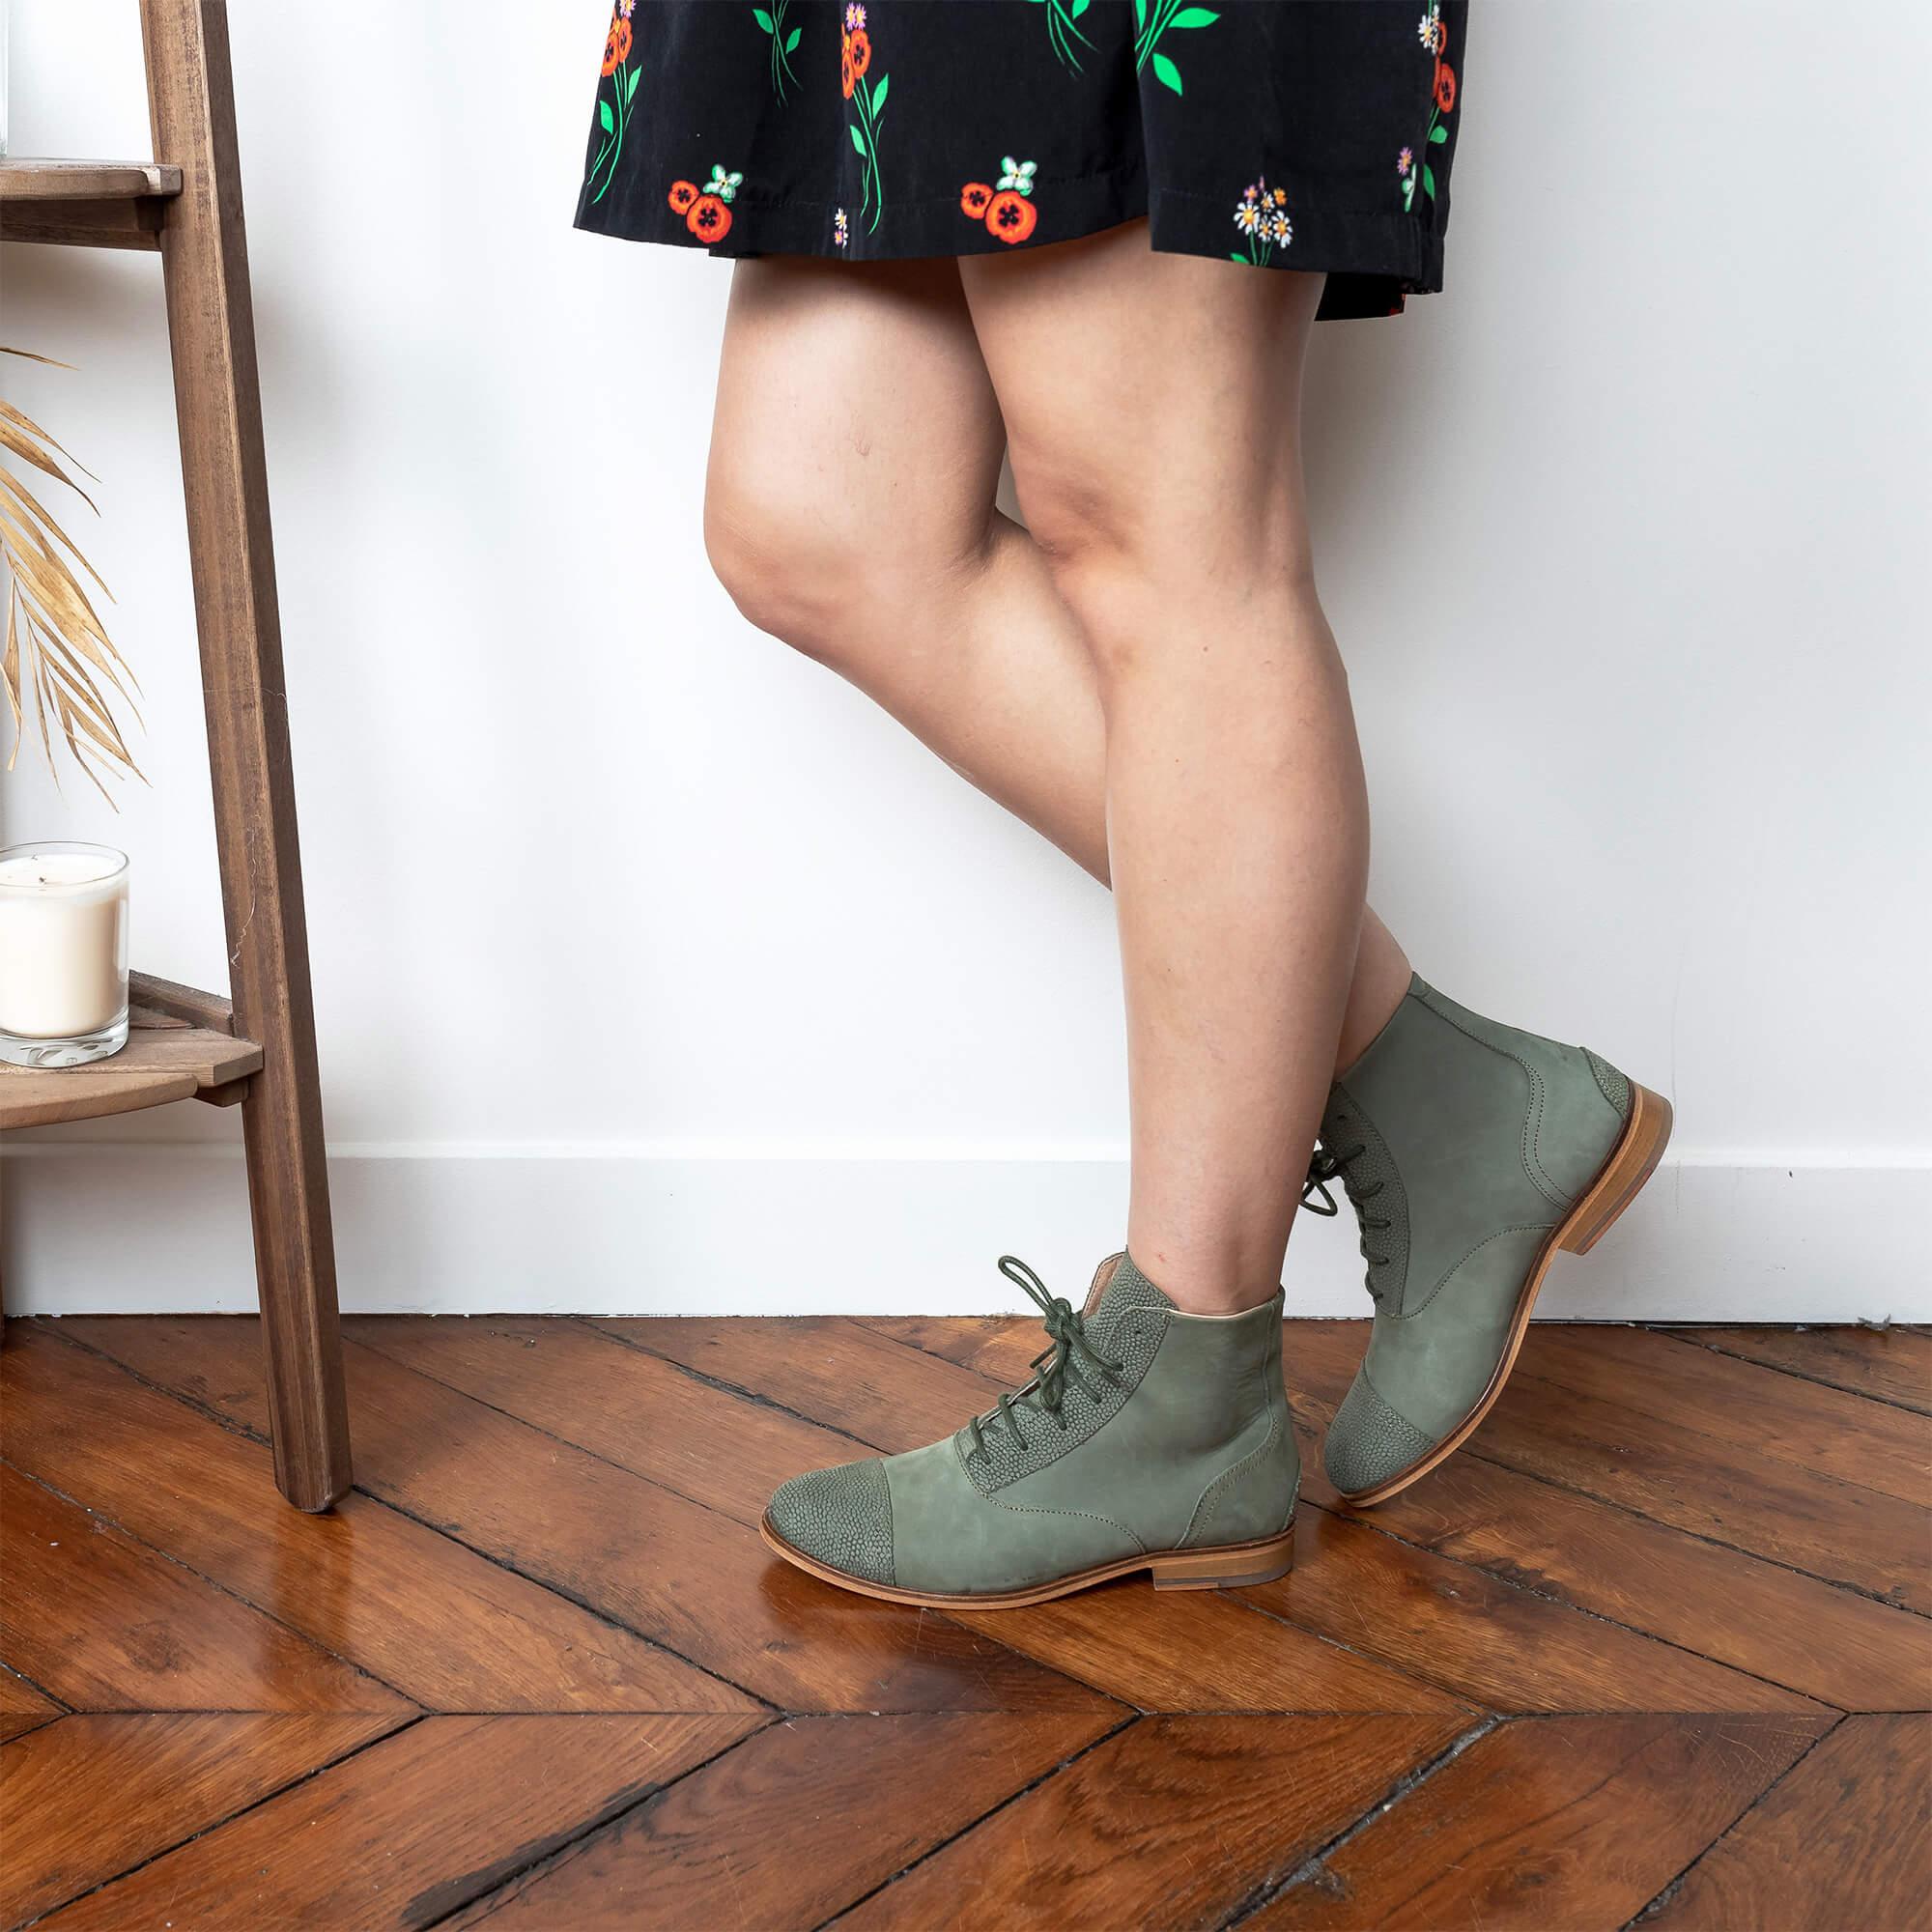 Mama Kiwi Khaki suede boots picture